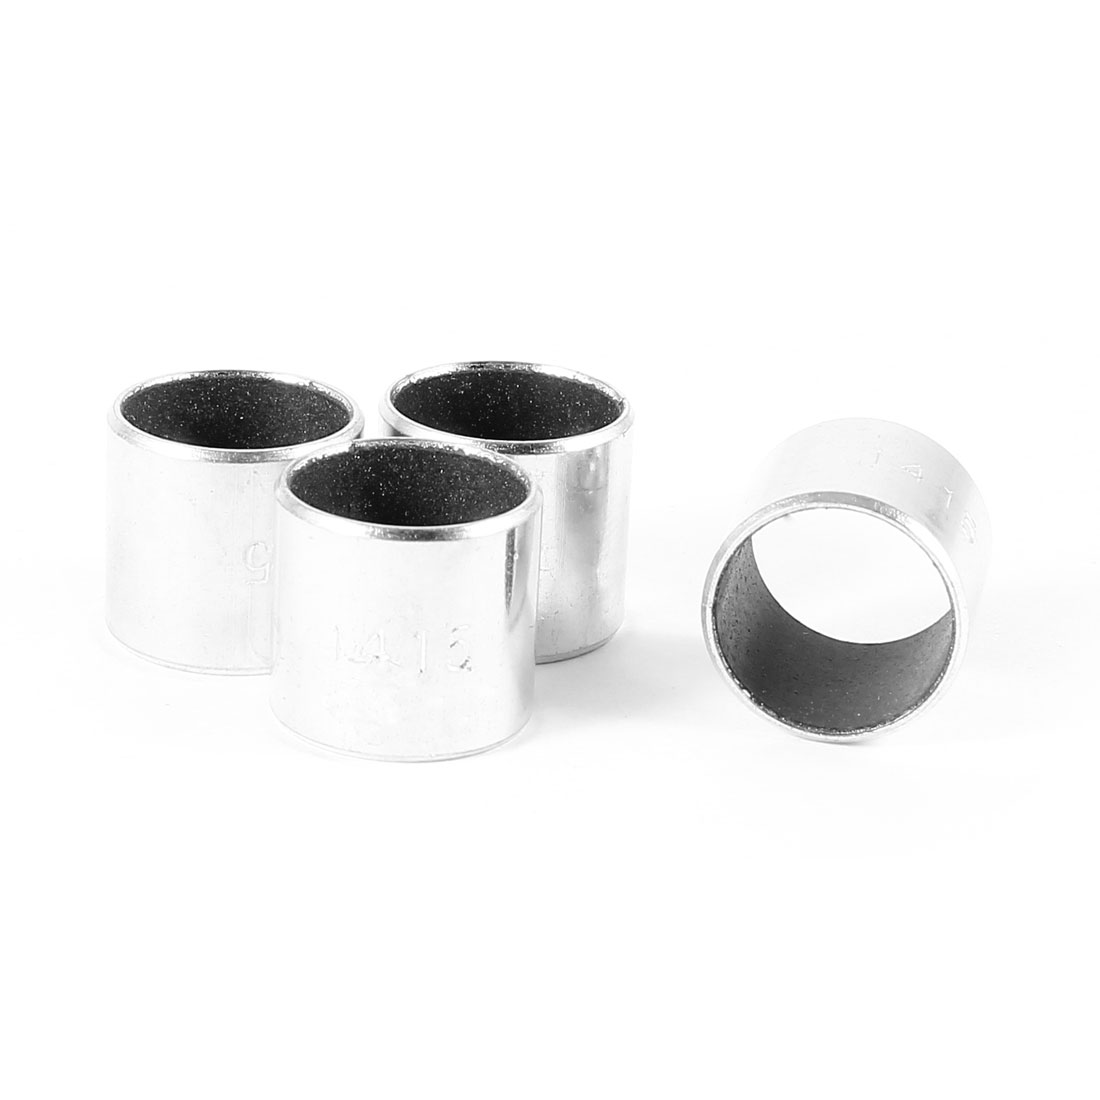 4pcs Silver Tone Self Lubricating Metal Plain Bearing Sleeve 15mm x 16mm x 14mm